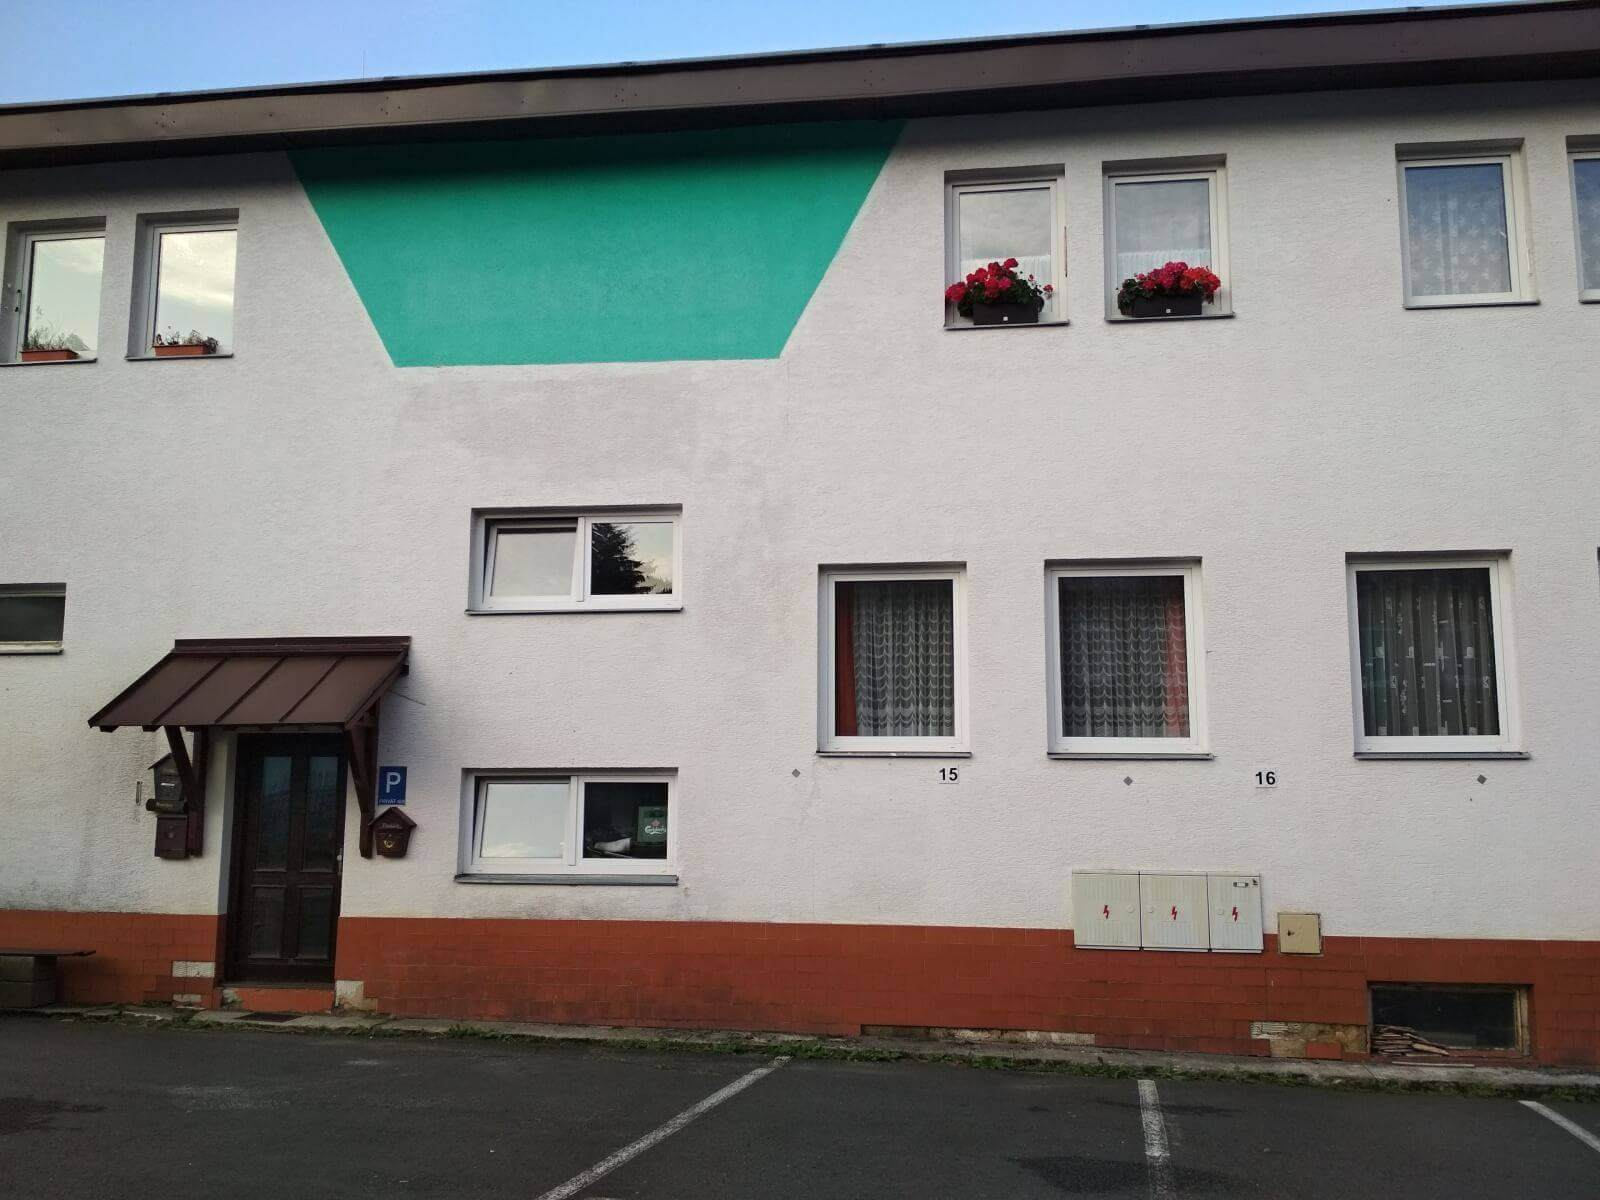 apartman-pernink-exterier